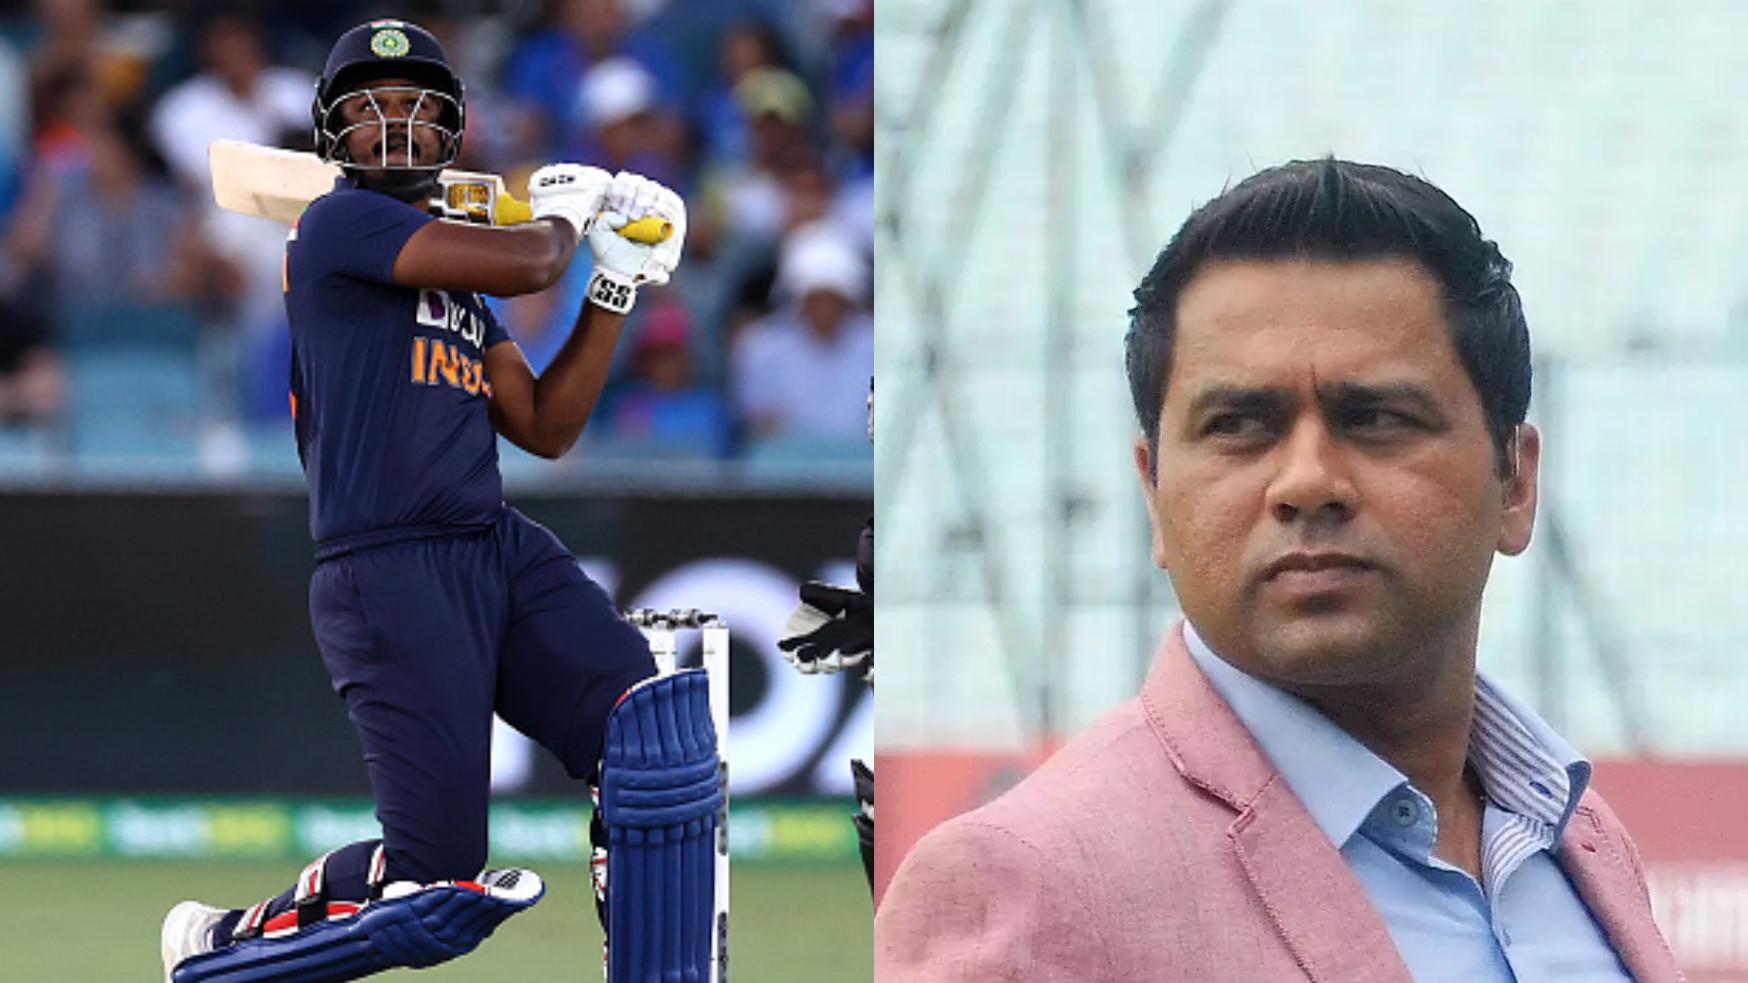 SL v IND 2021: Sanju Samson should play according to situation if he gets a chance in Sri Lanka- Aakash Chopra